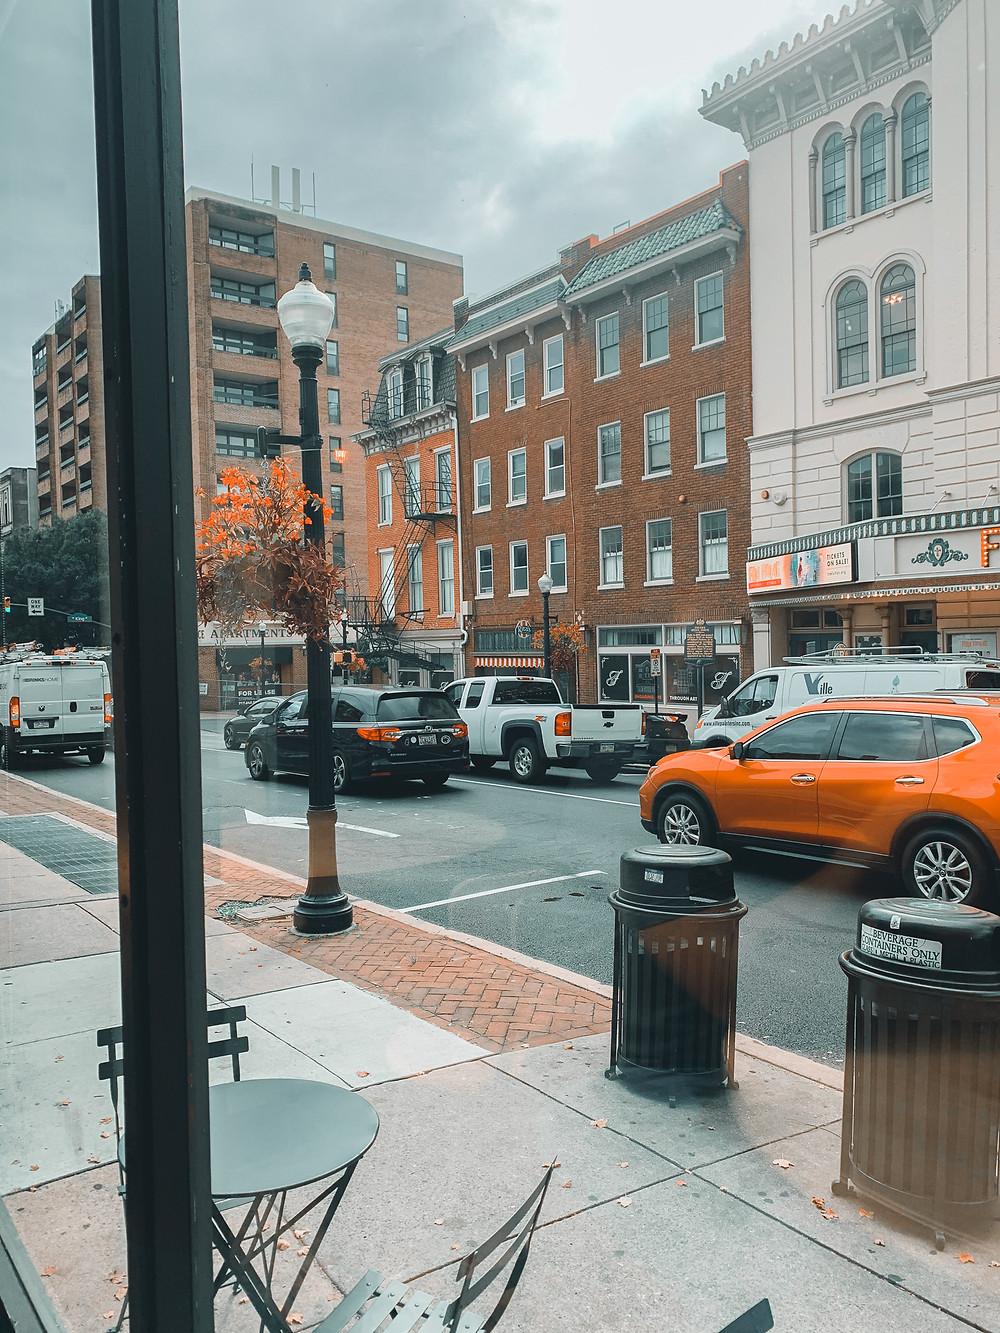 Downtown Lancaster, brick buildings, city street, cars in street, sidewalk, high rise building, street light, trash cans on street